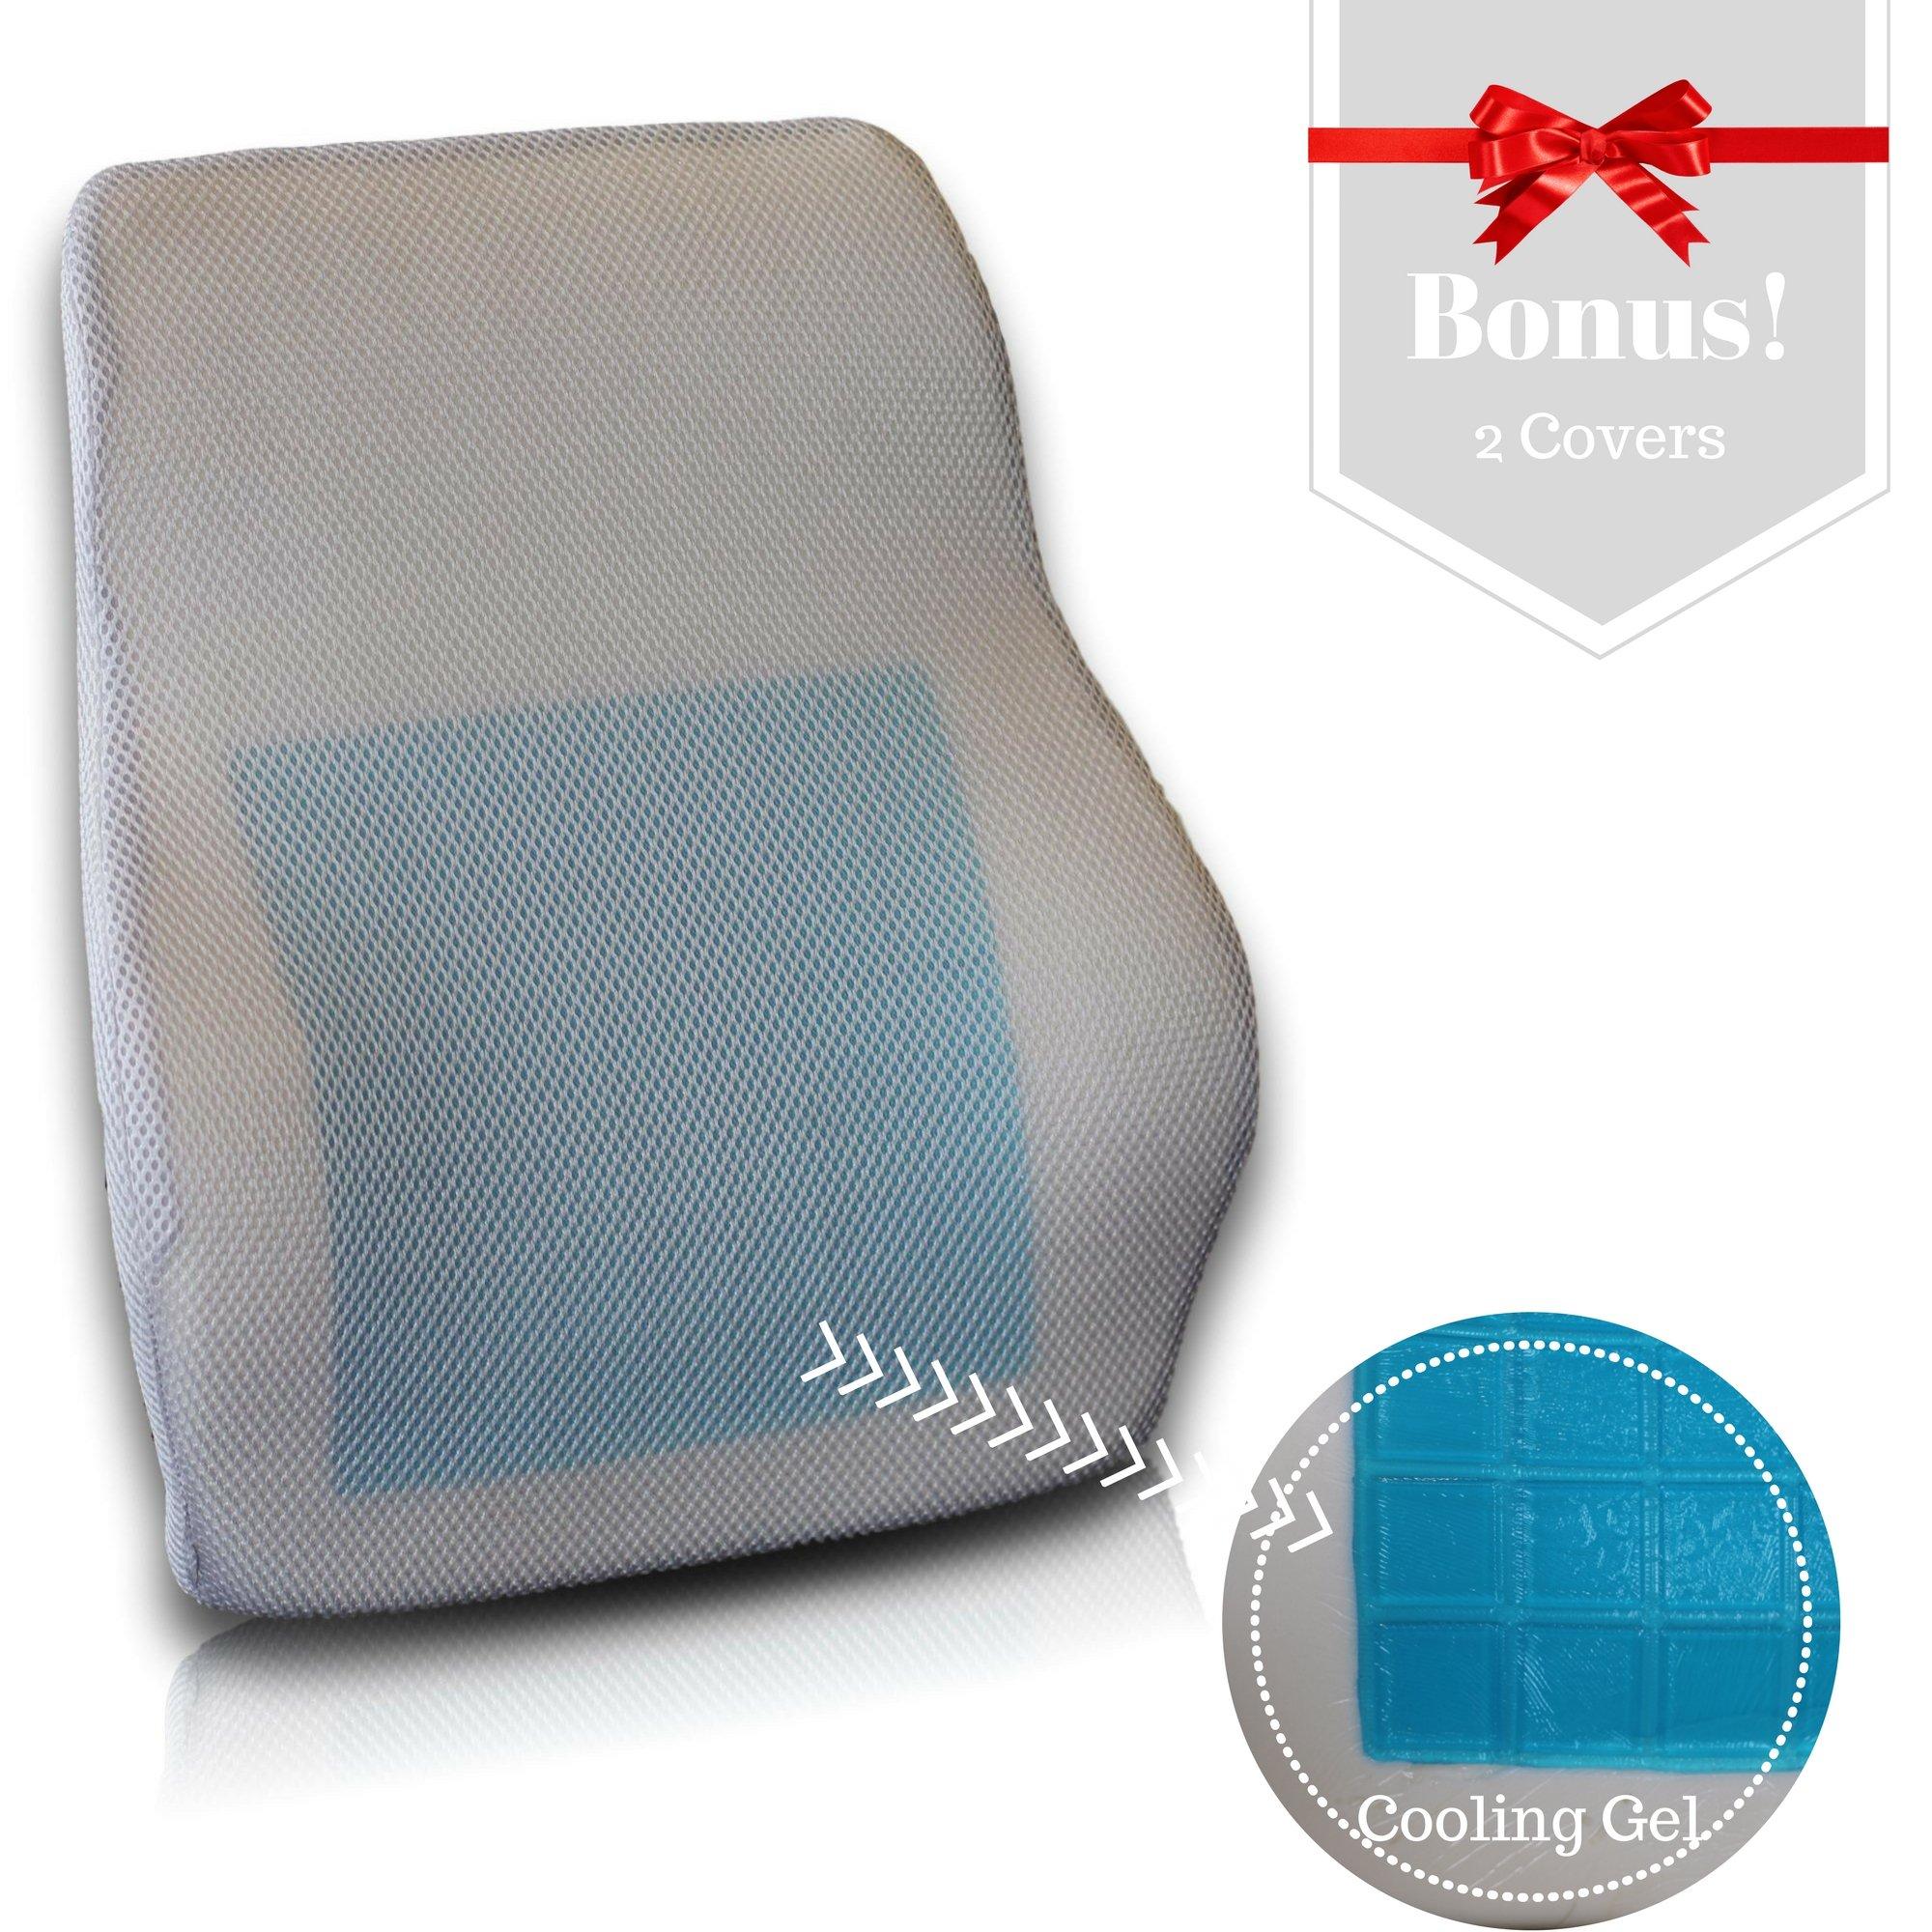 AirGo Products Cooling Gel Memory Foam Lumbar Cushion